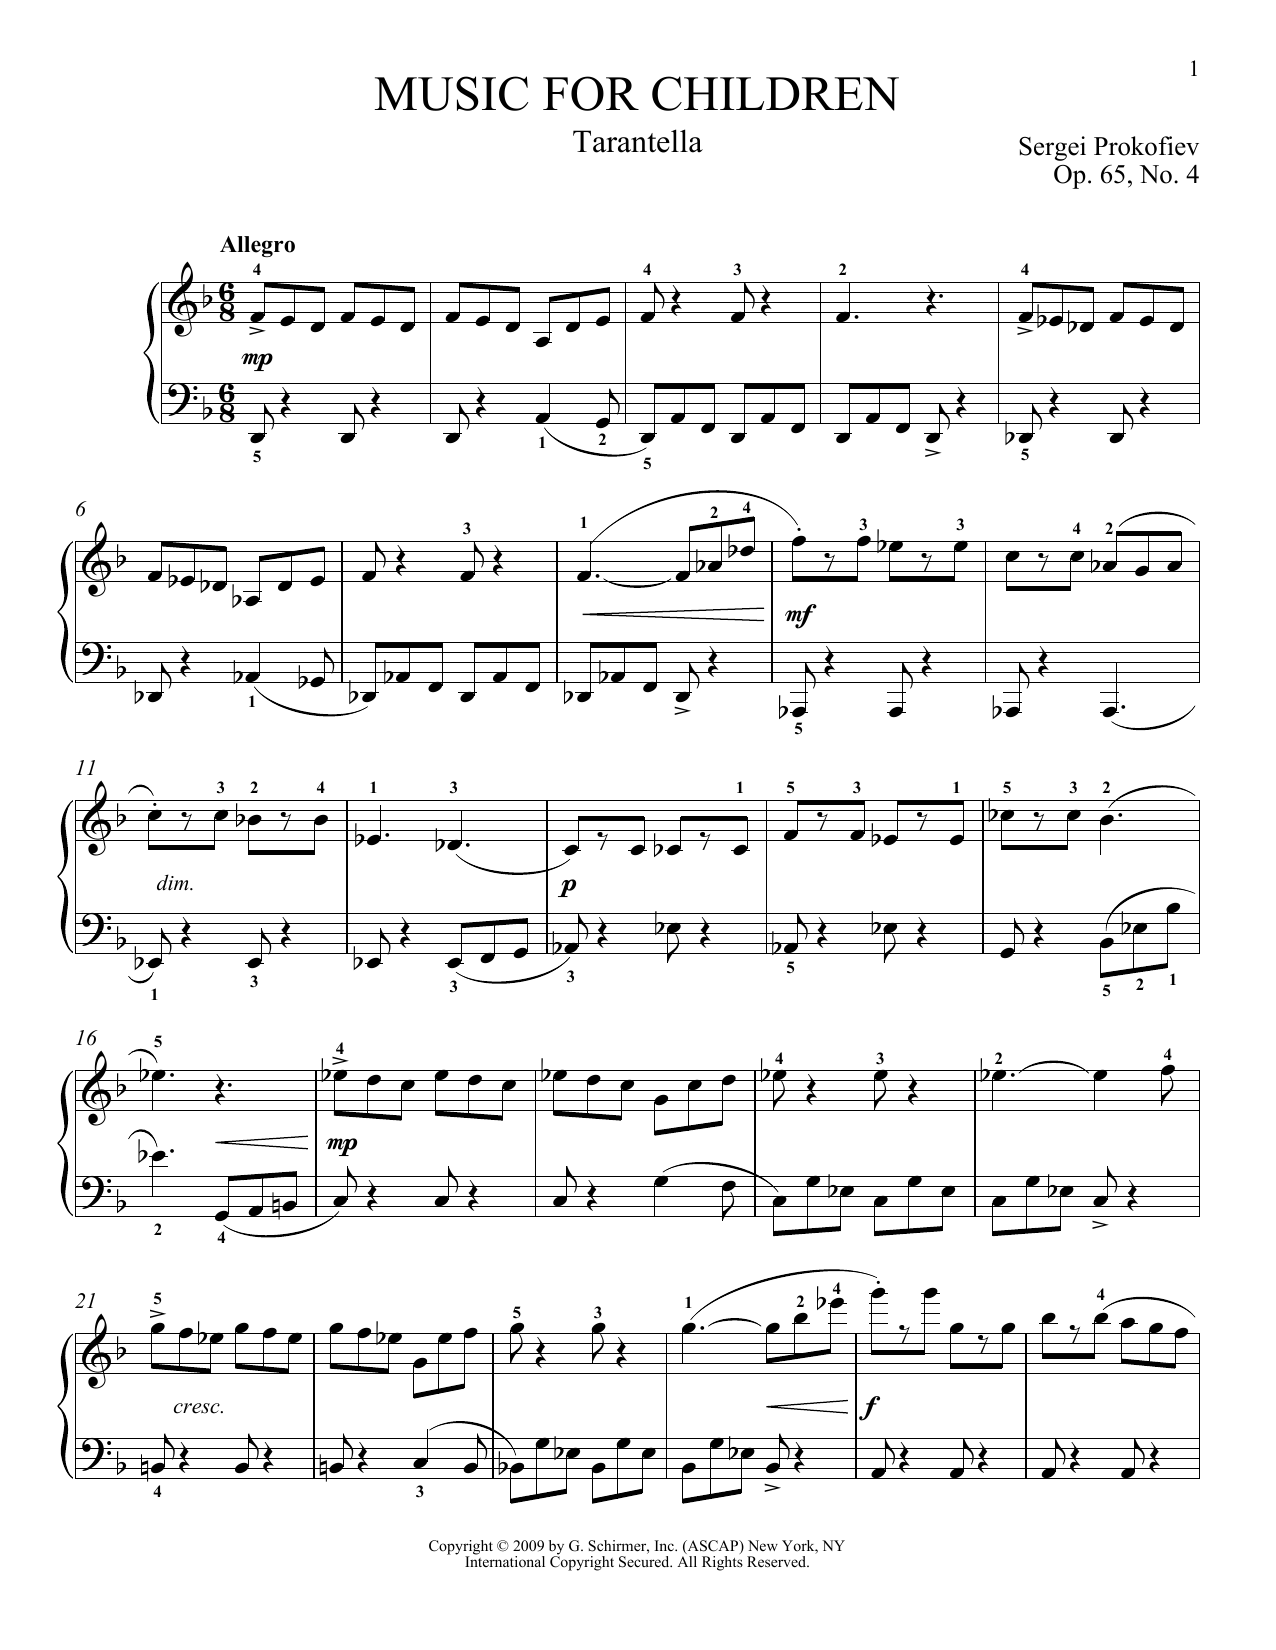 Tarantella sheet music by Sergei Prokofiev Piano  73508